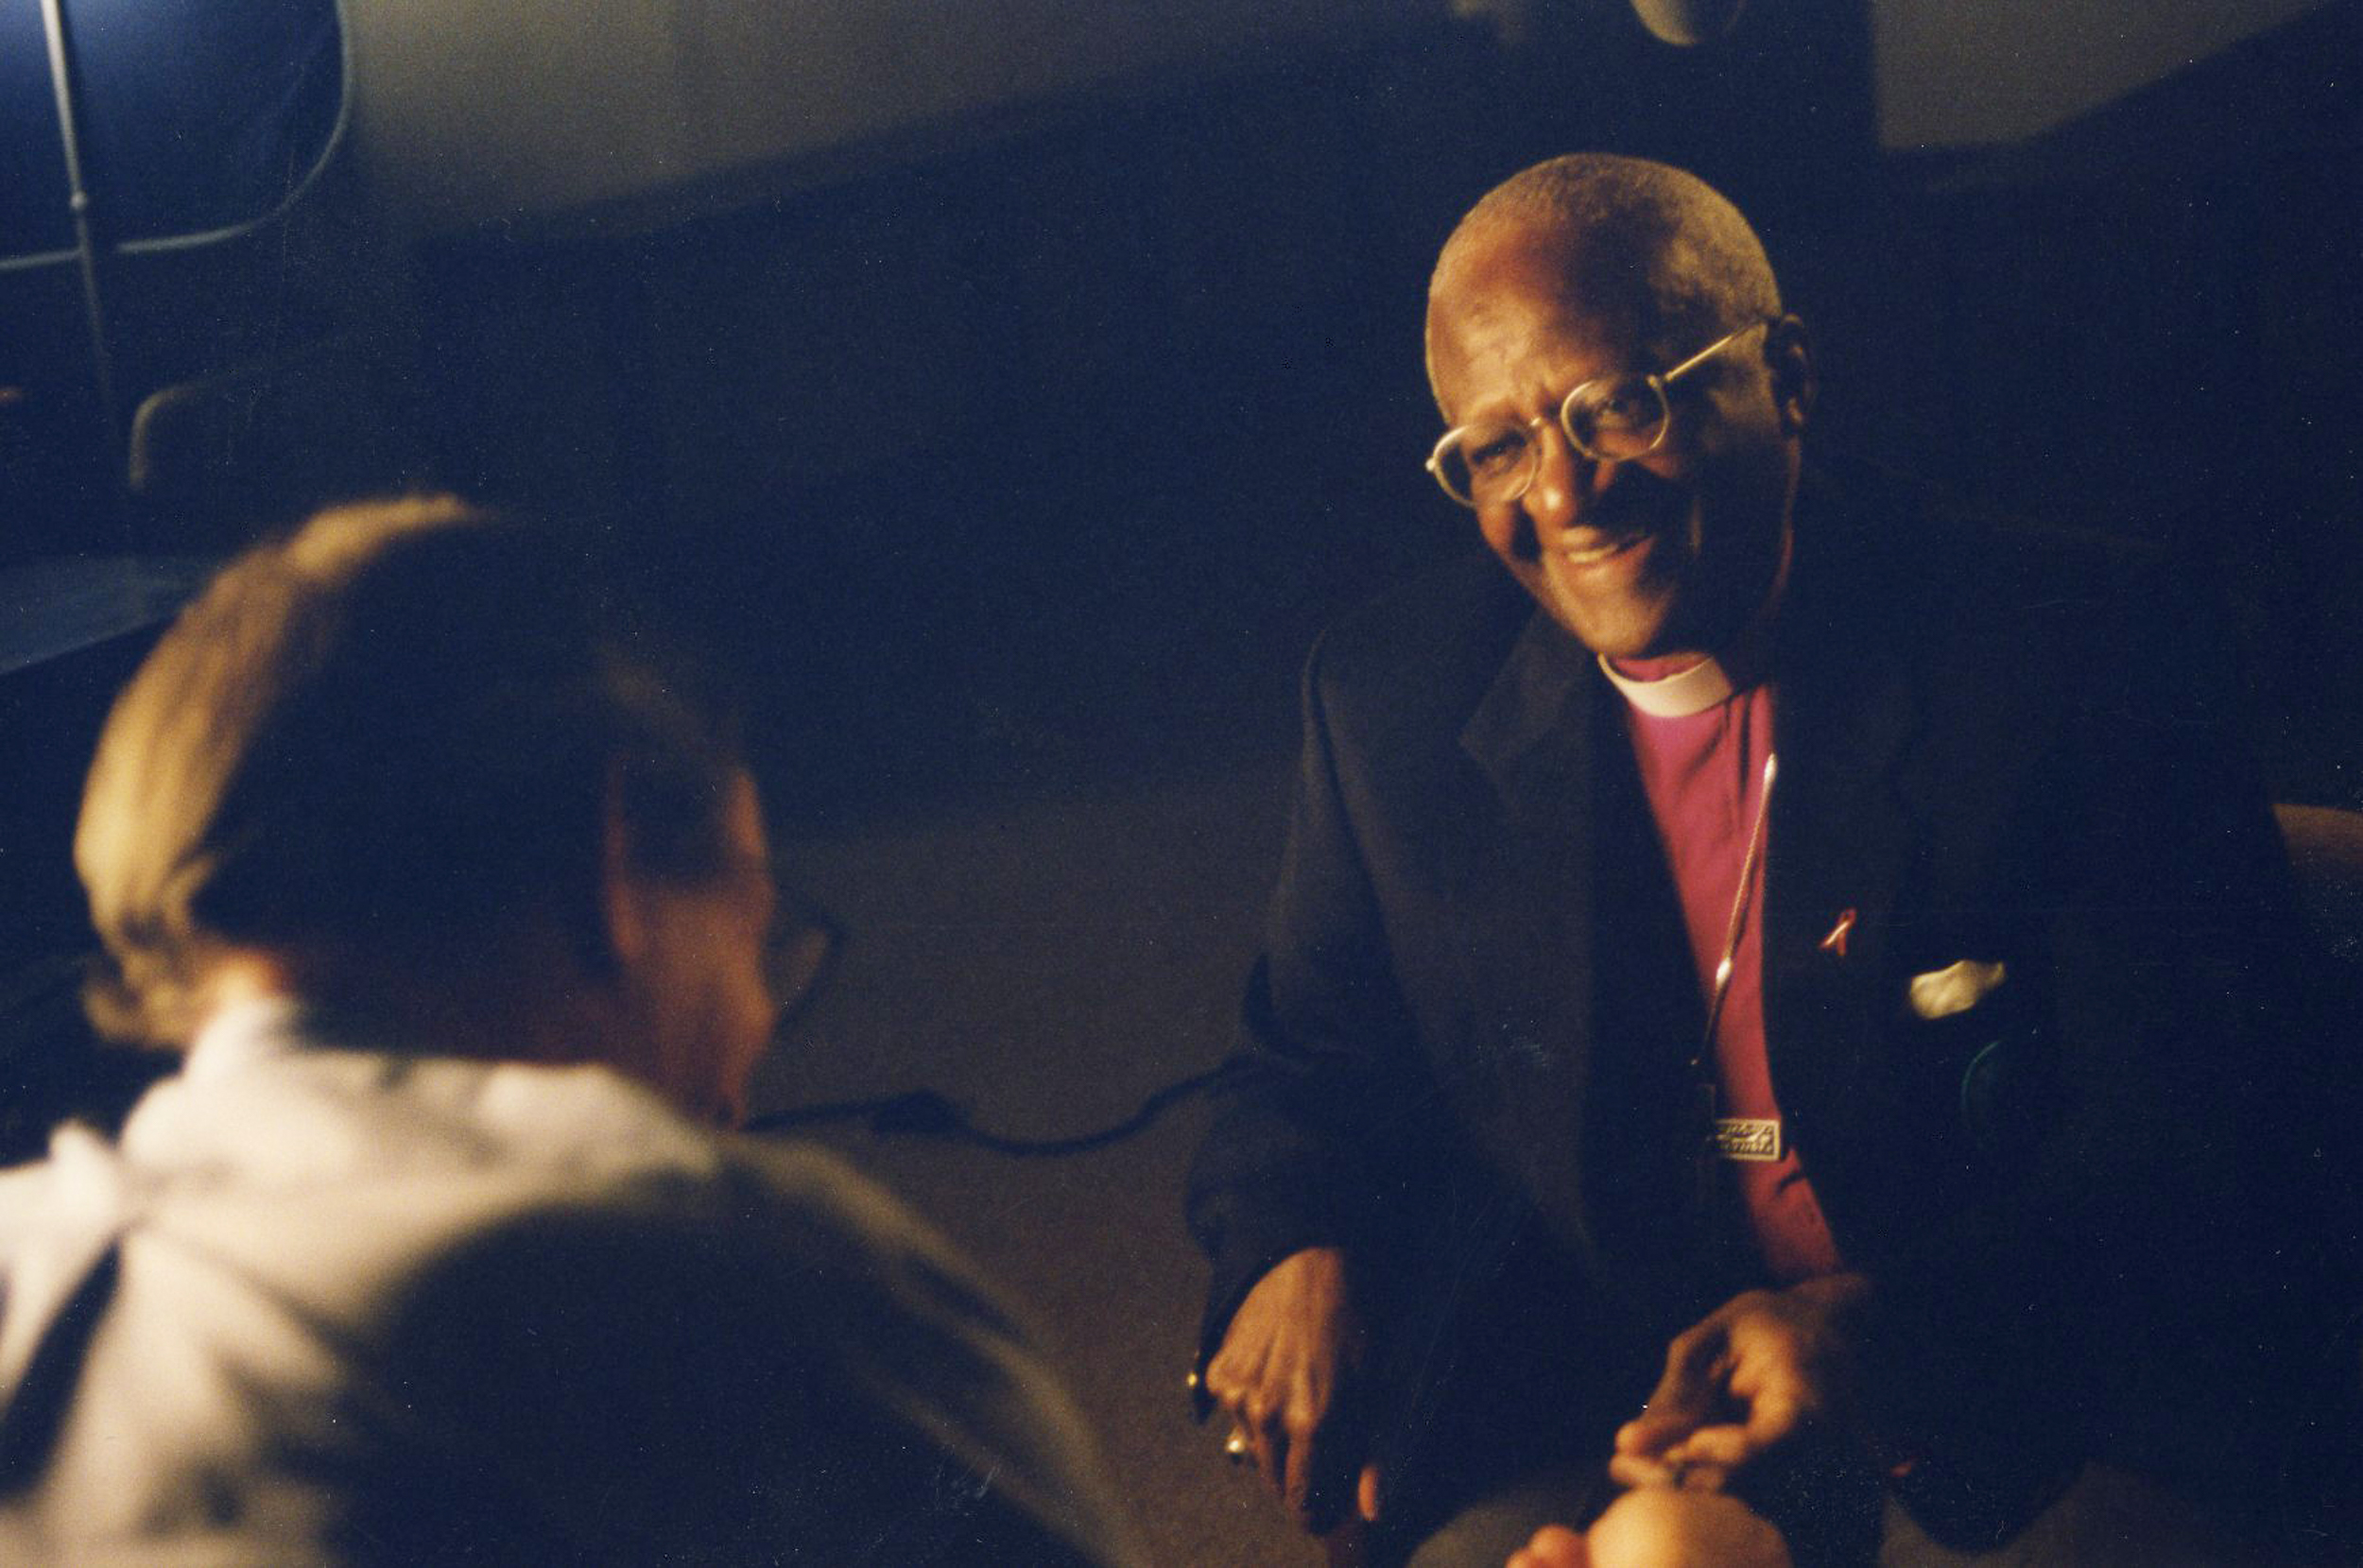 SY Desmond Tutu.190717_yorkzim012.jpg